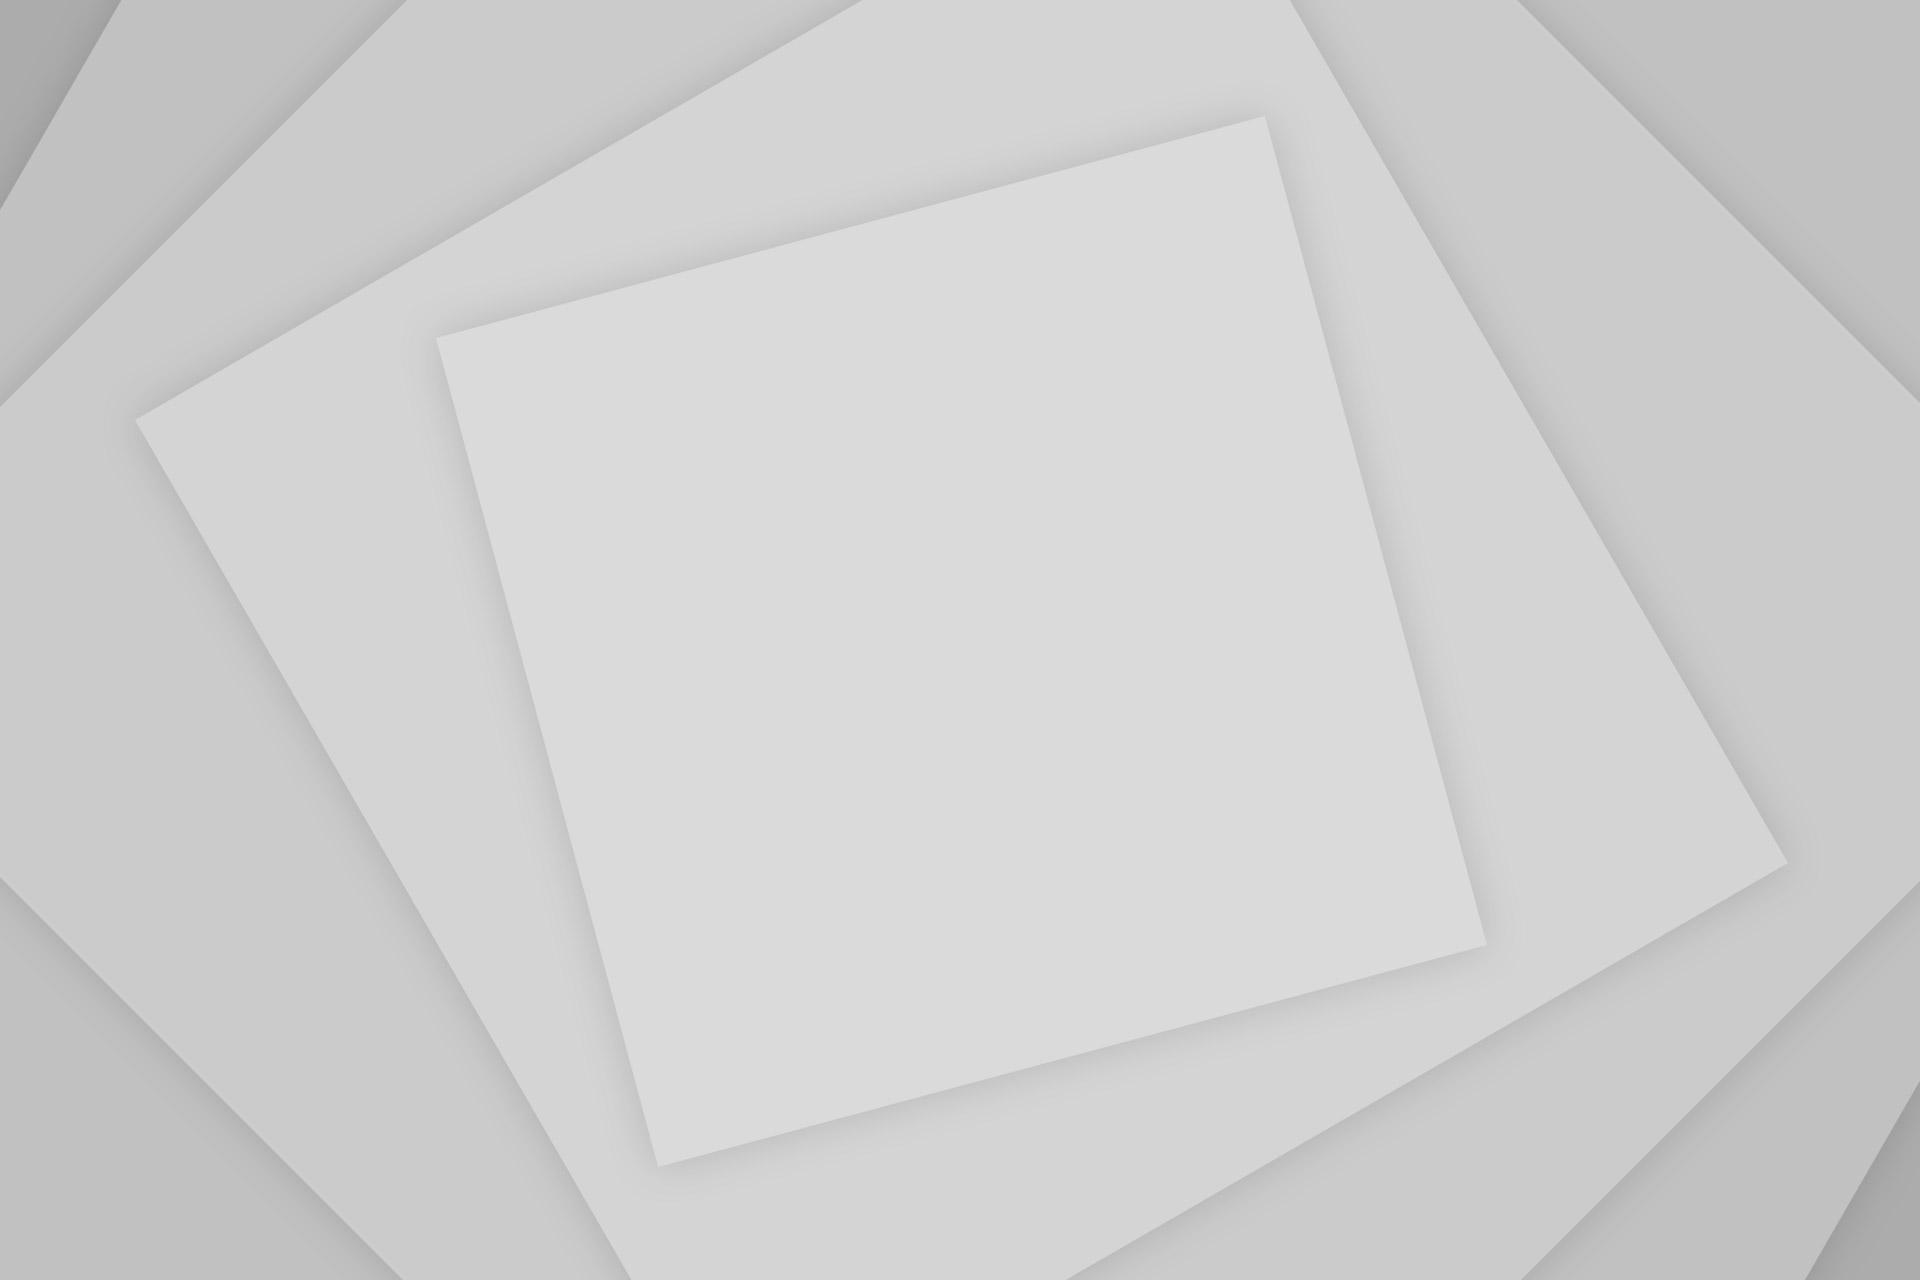 <iframe src='http://www.criticalcommons.org/Members/sammondn/clips/duck-amuck/embed_view' frameborder='0' width='630' height='460' allowfullscreen></iframe>